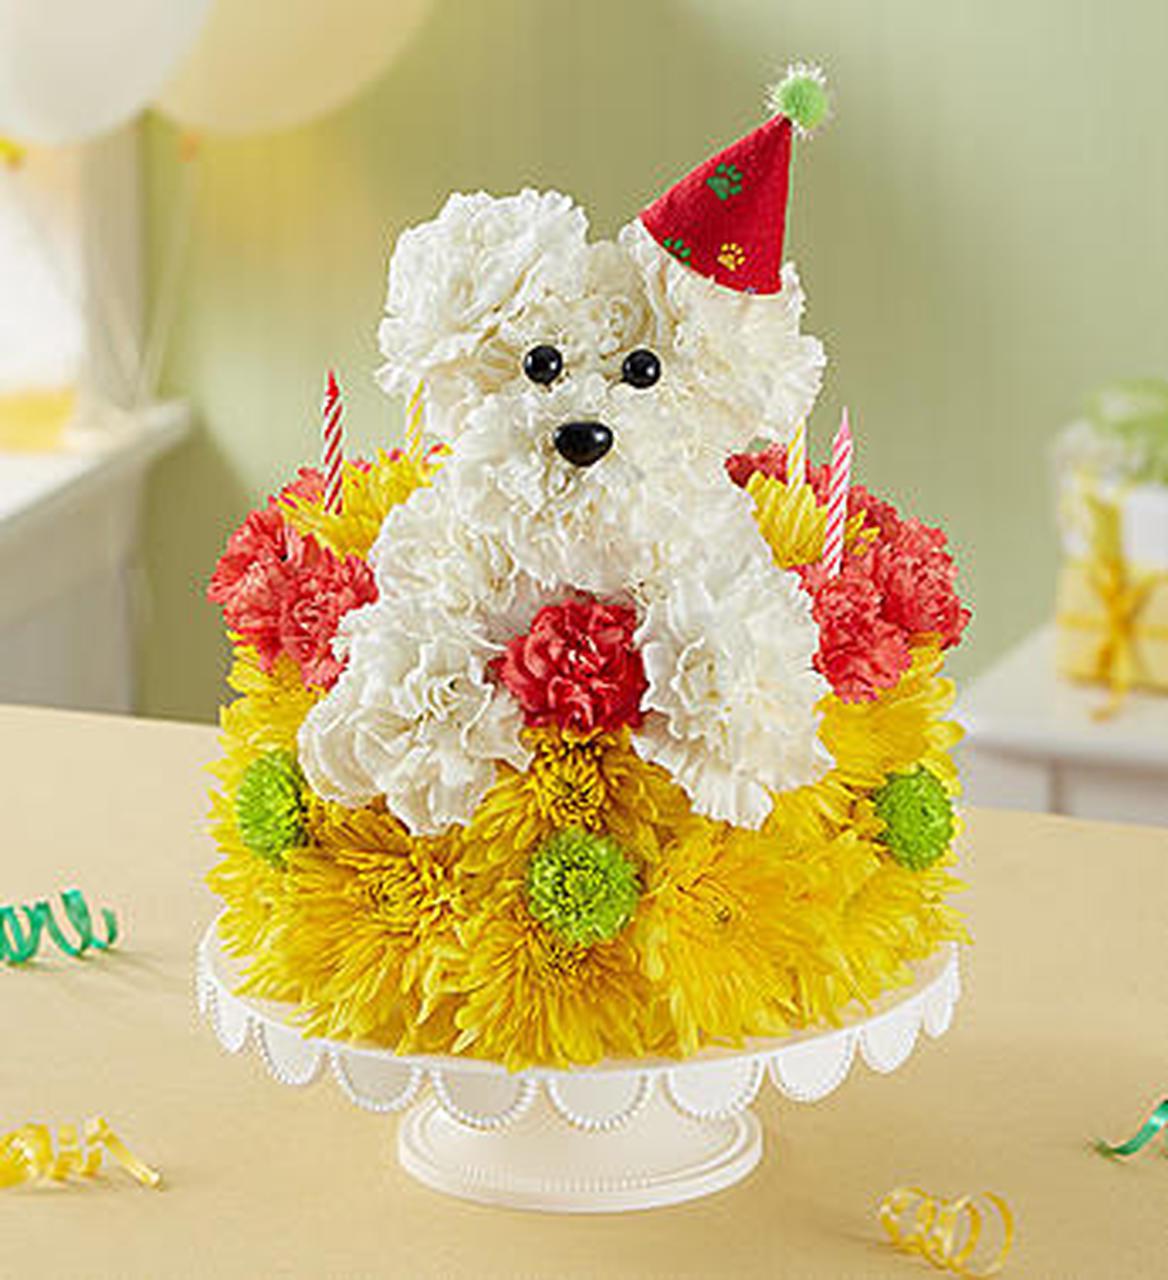 Flowers Birthday Cake  Birthday Wishes Flower Cake Pupcake Conroy s Flowers